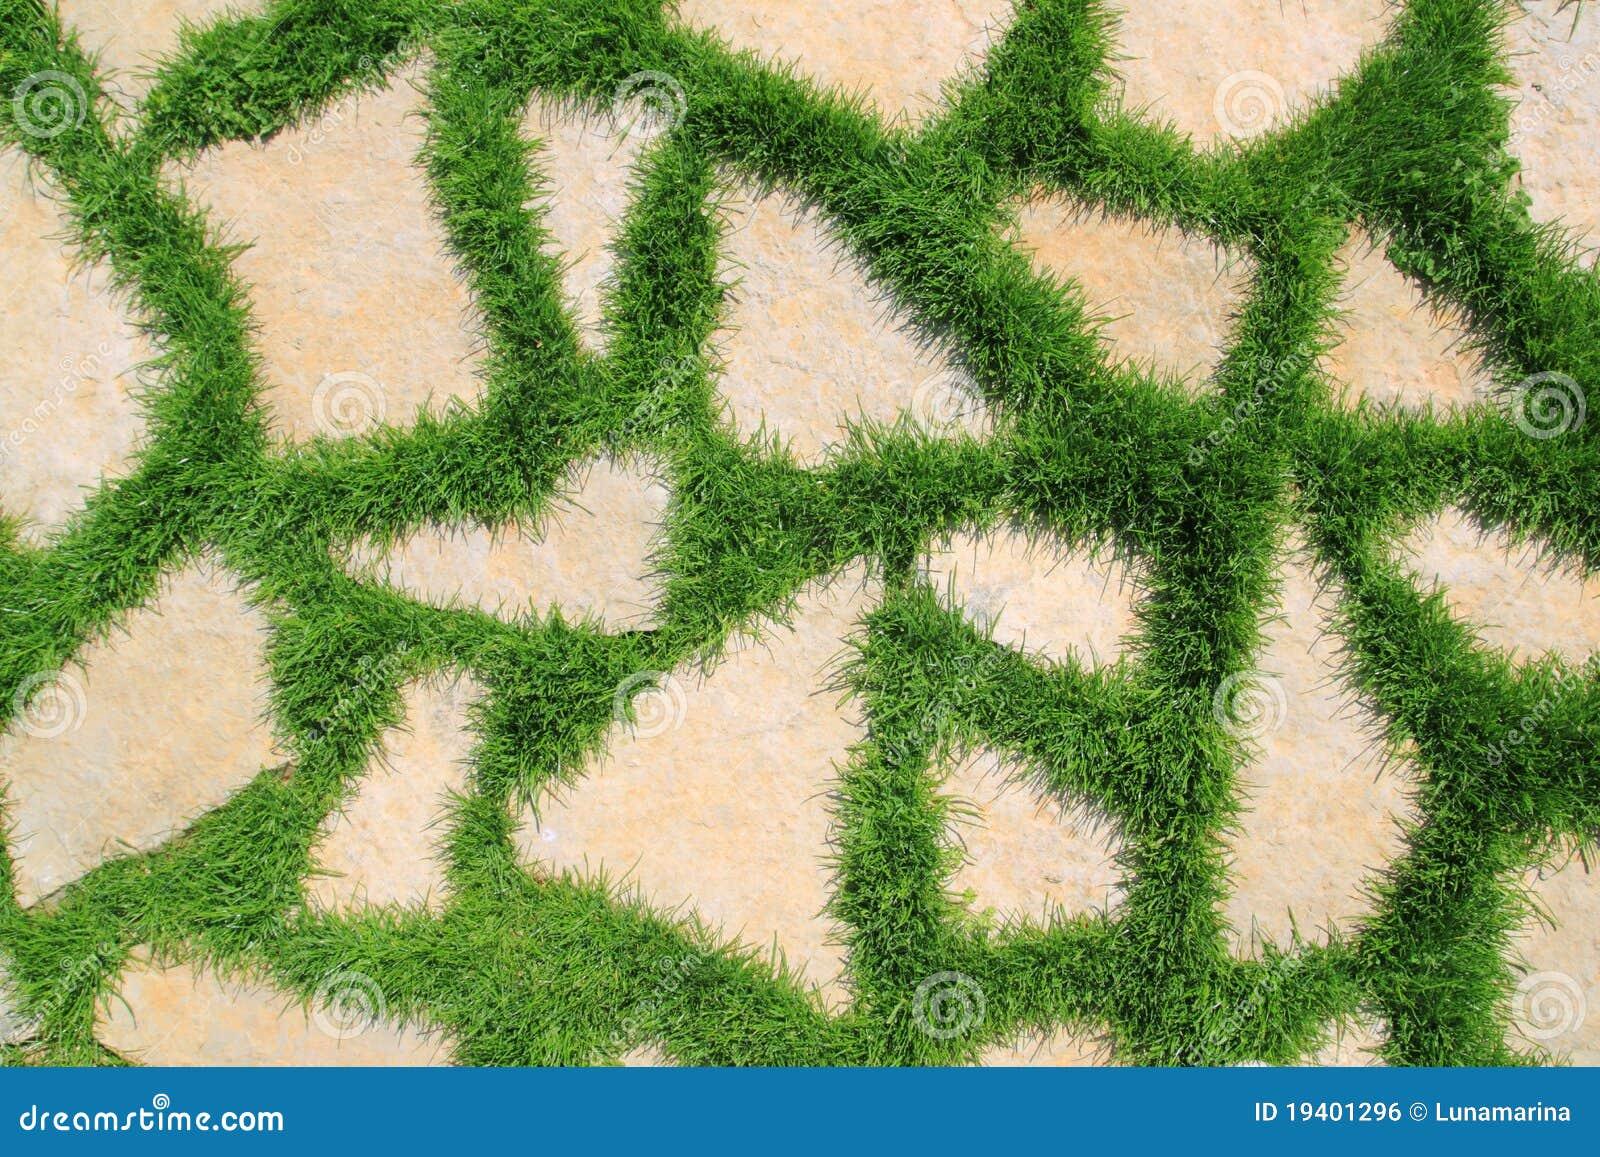 Stone path in green grass garden texture stock photo for Jardines verdes